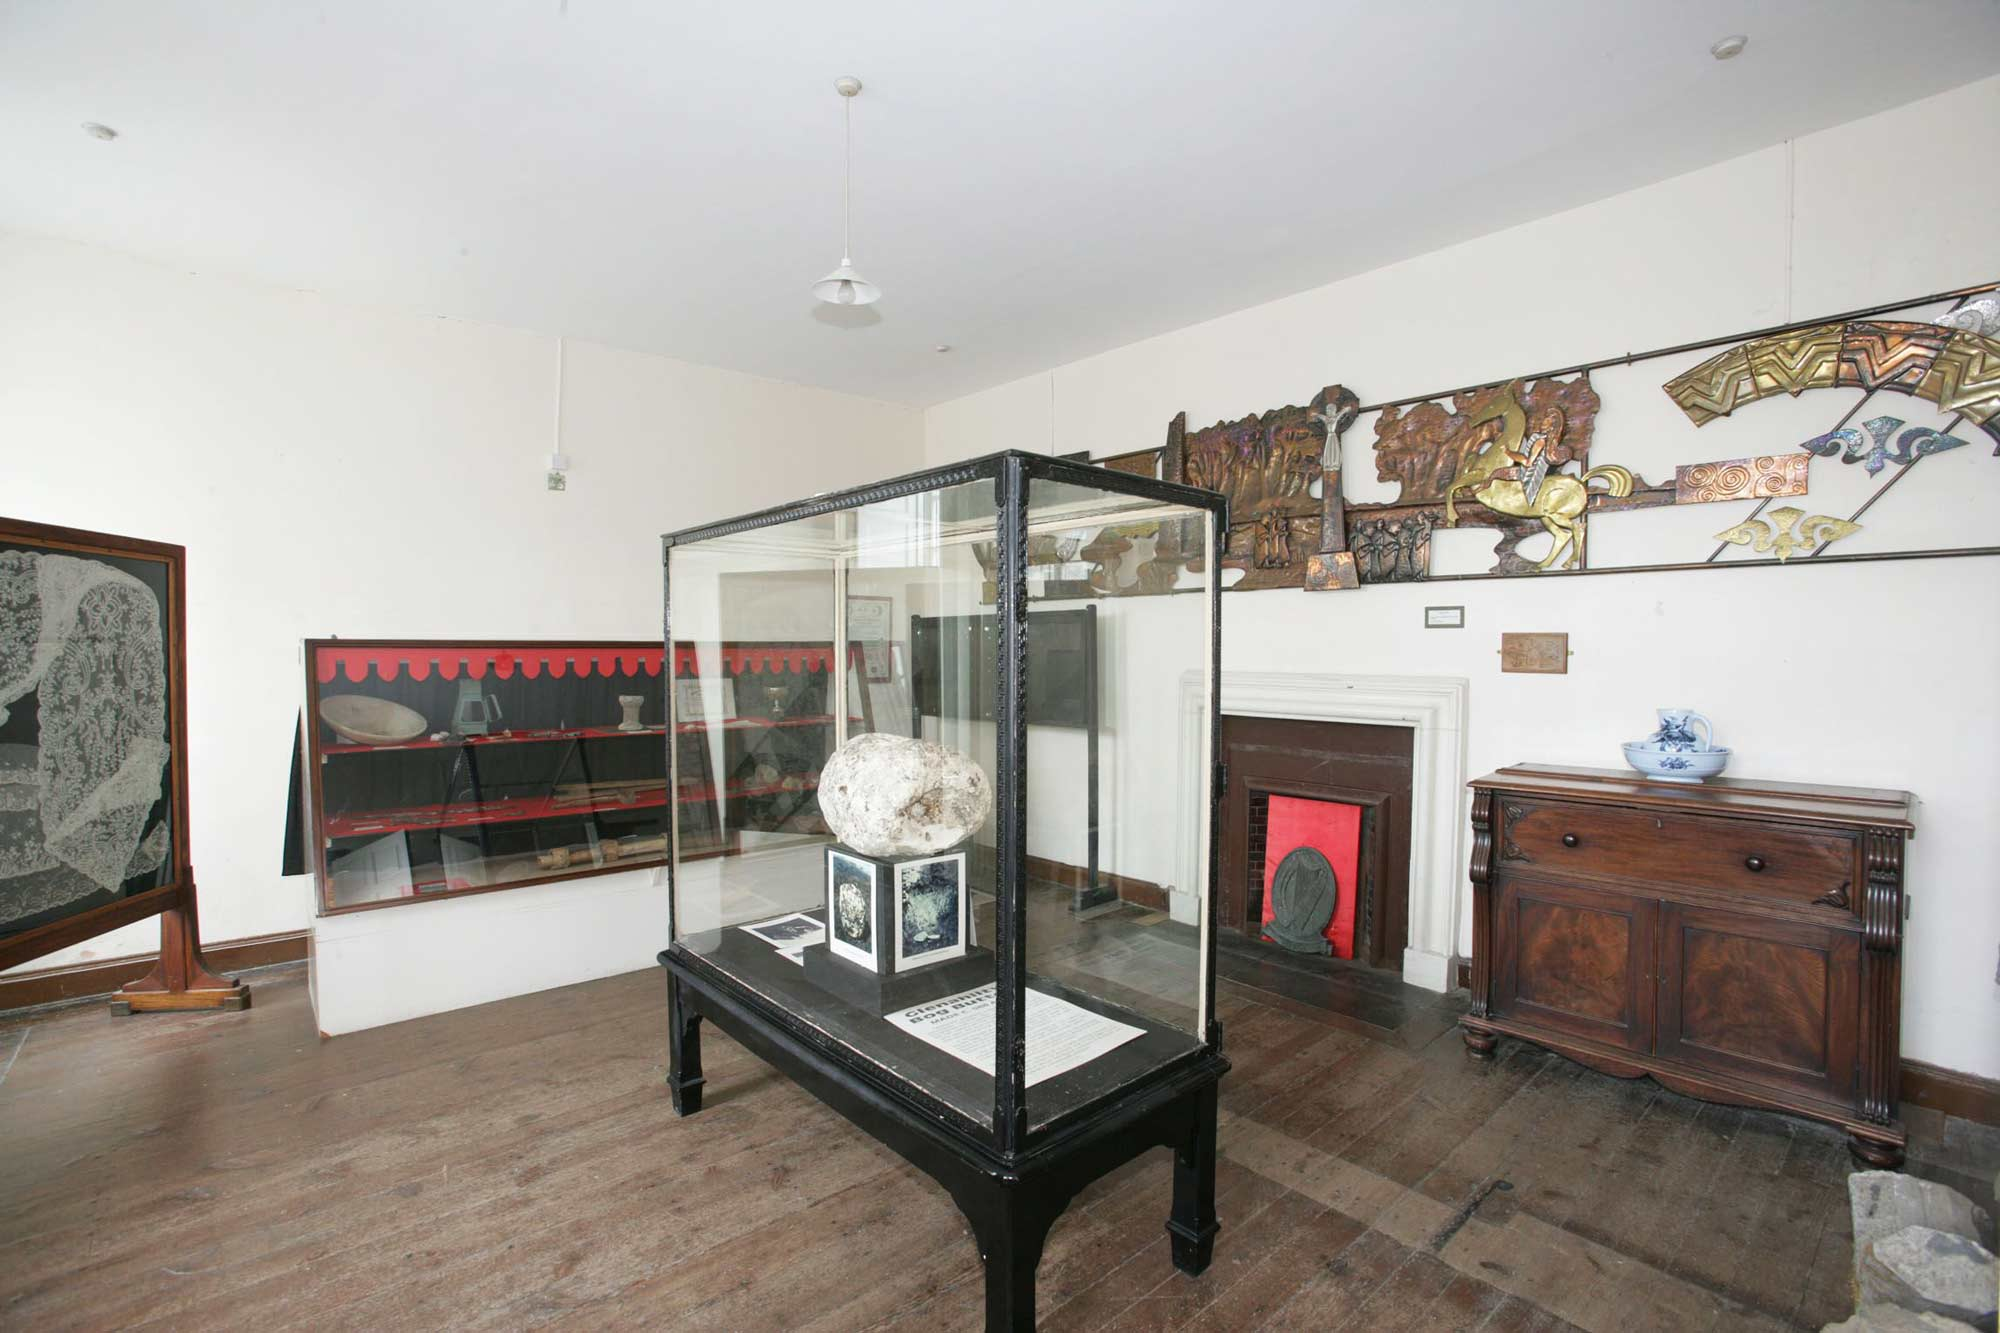 Damer House exhibition